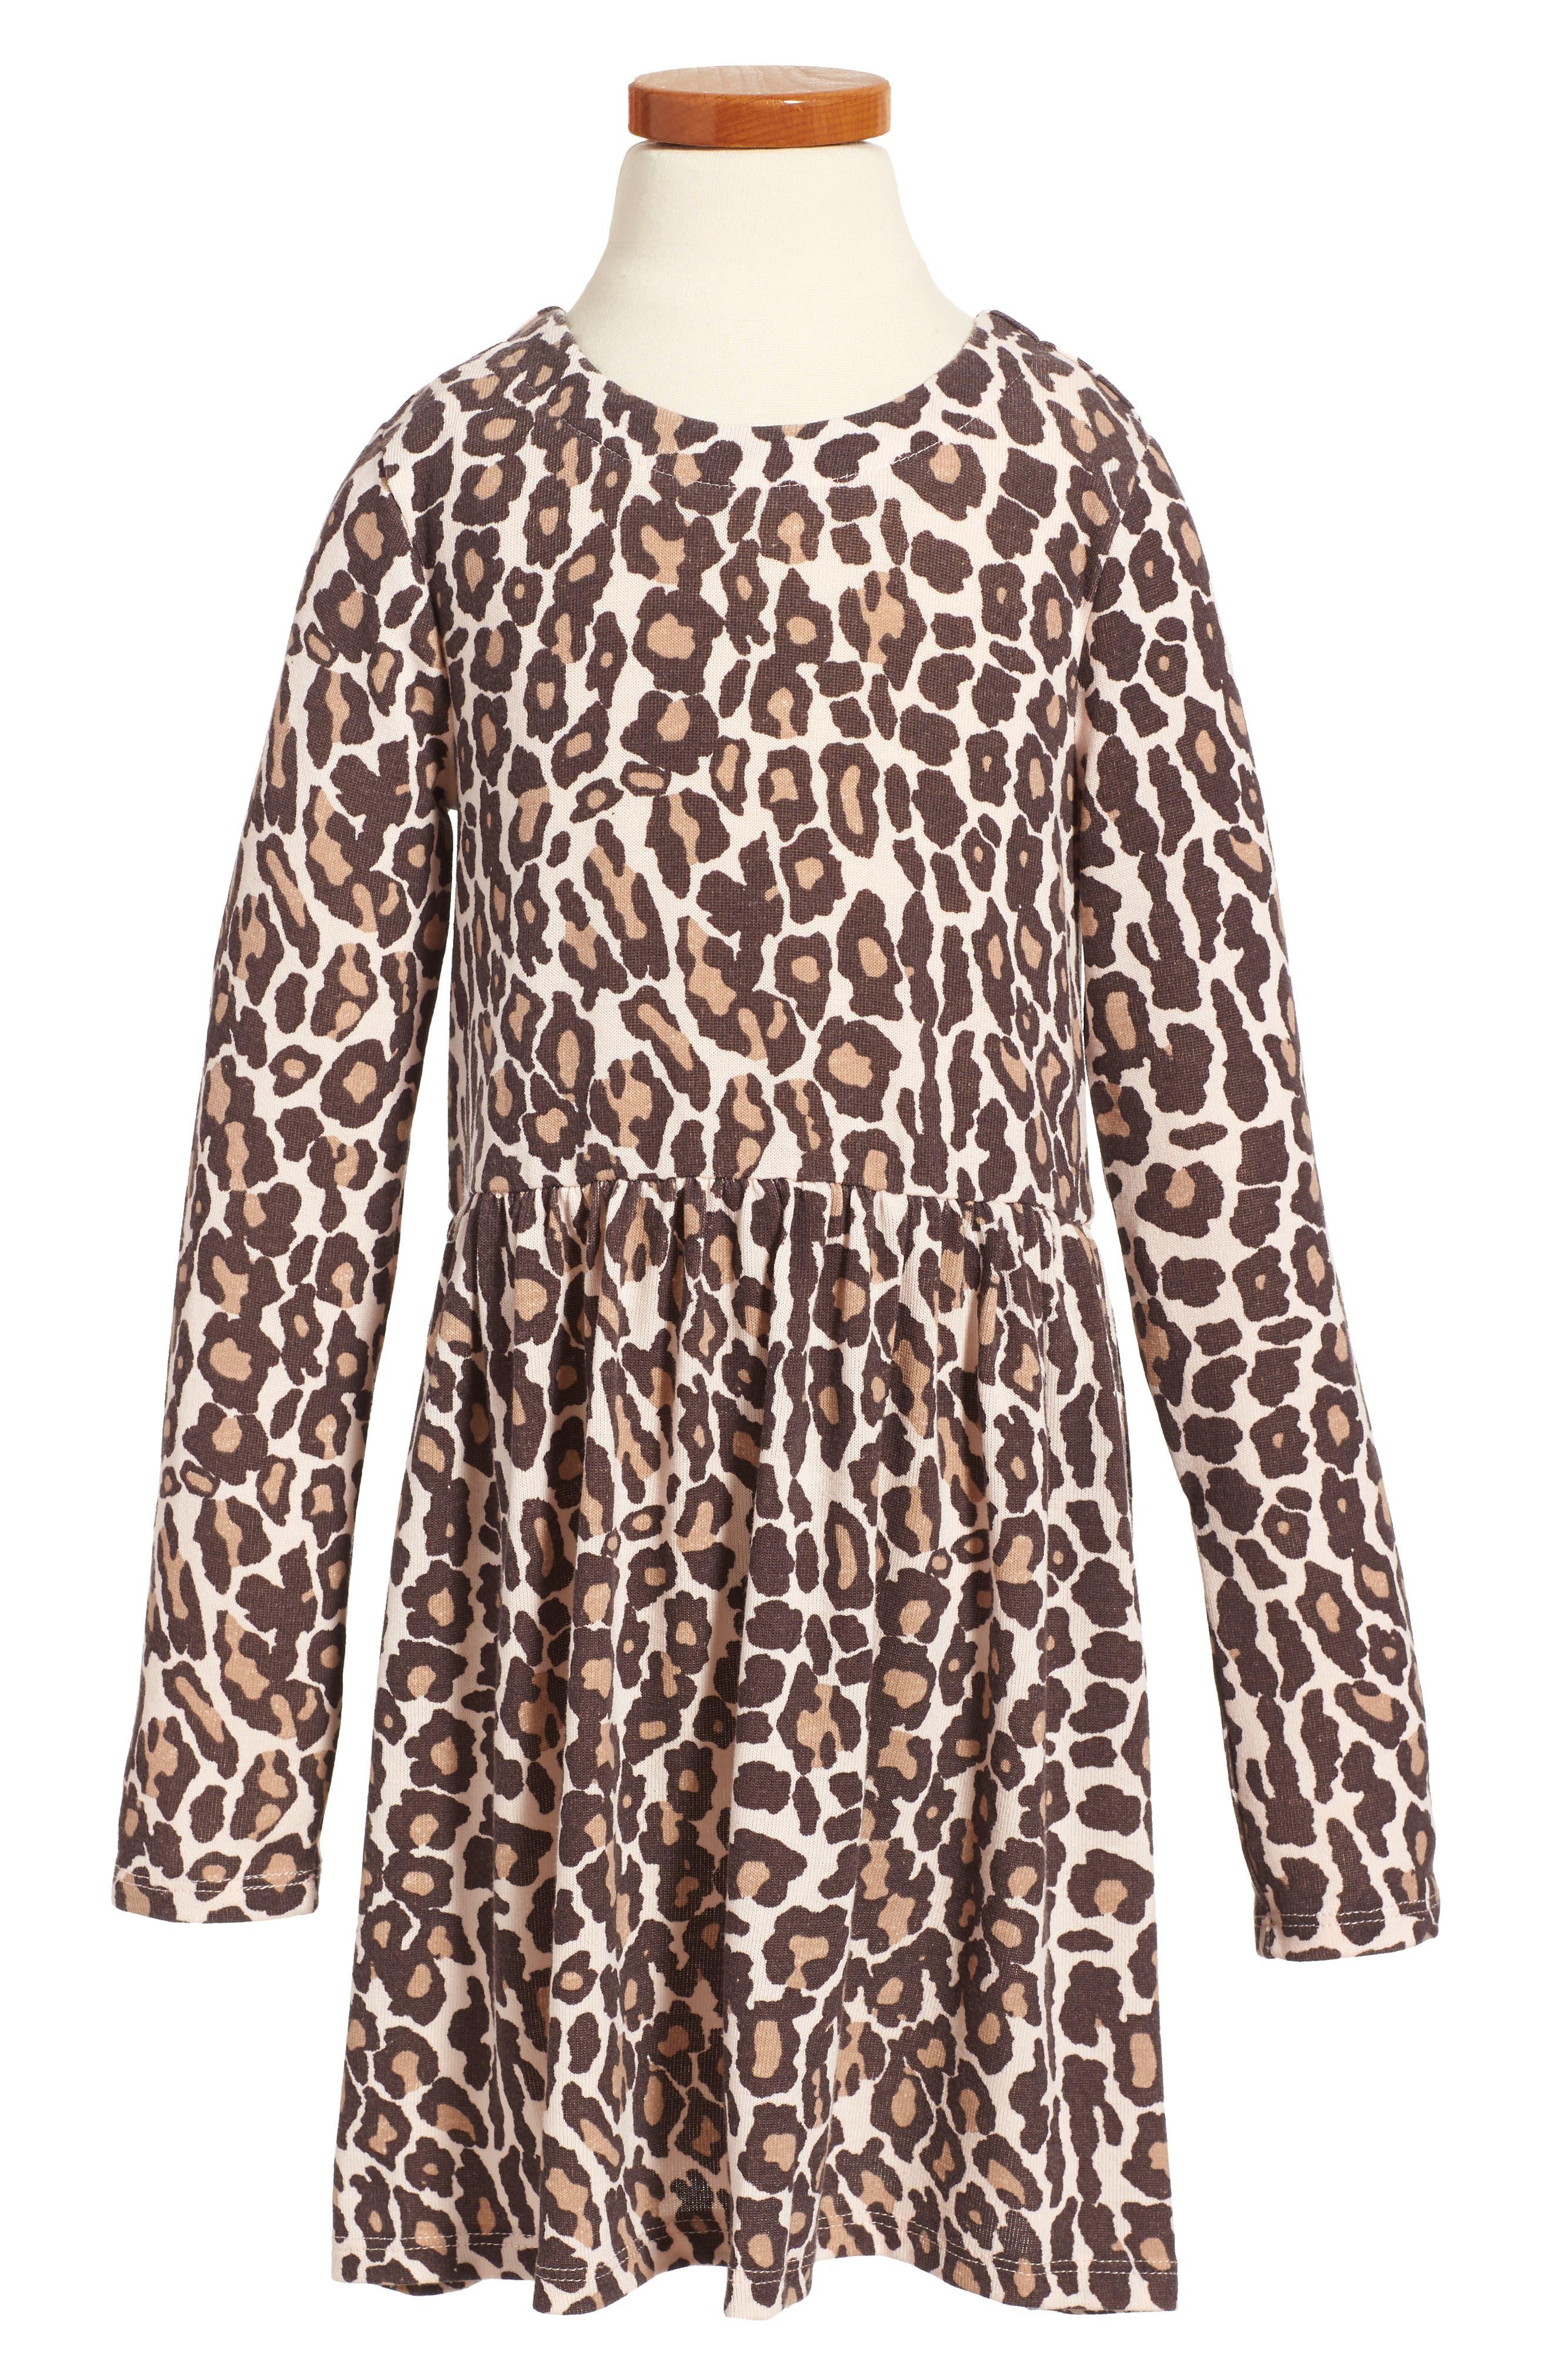 Main Image - Splendid Animal Print Loose Knit Dress (Toddler Girls & Little Girls)